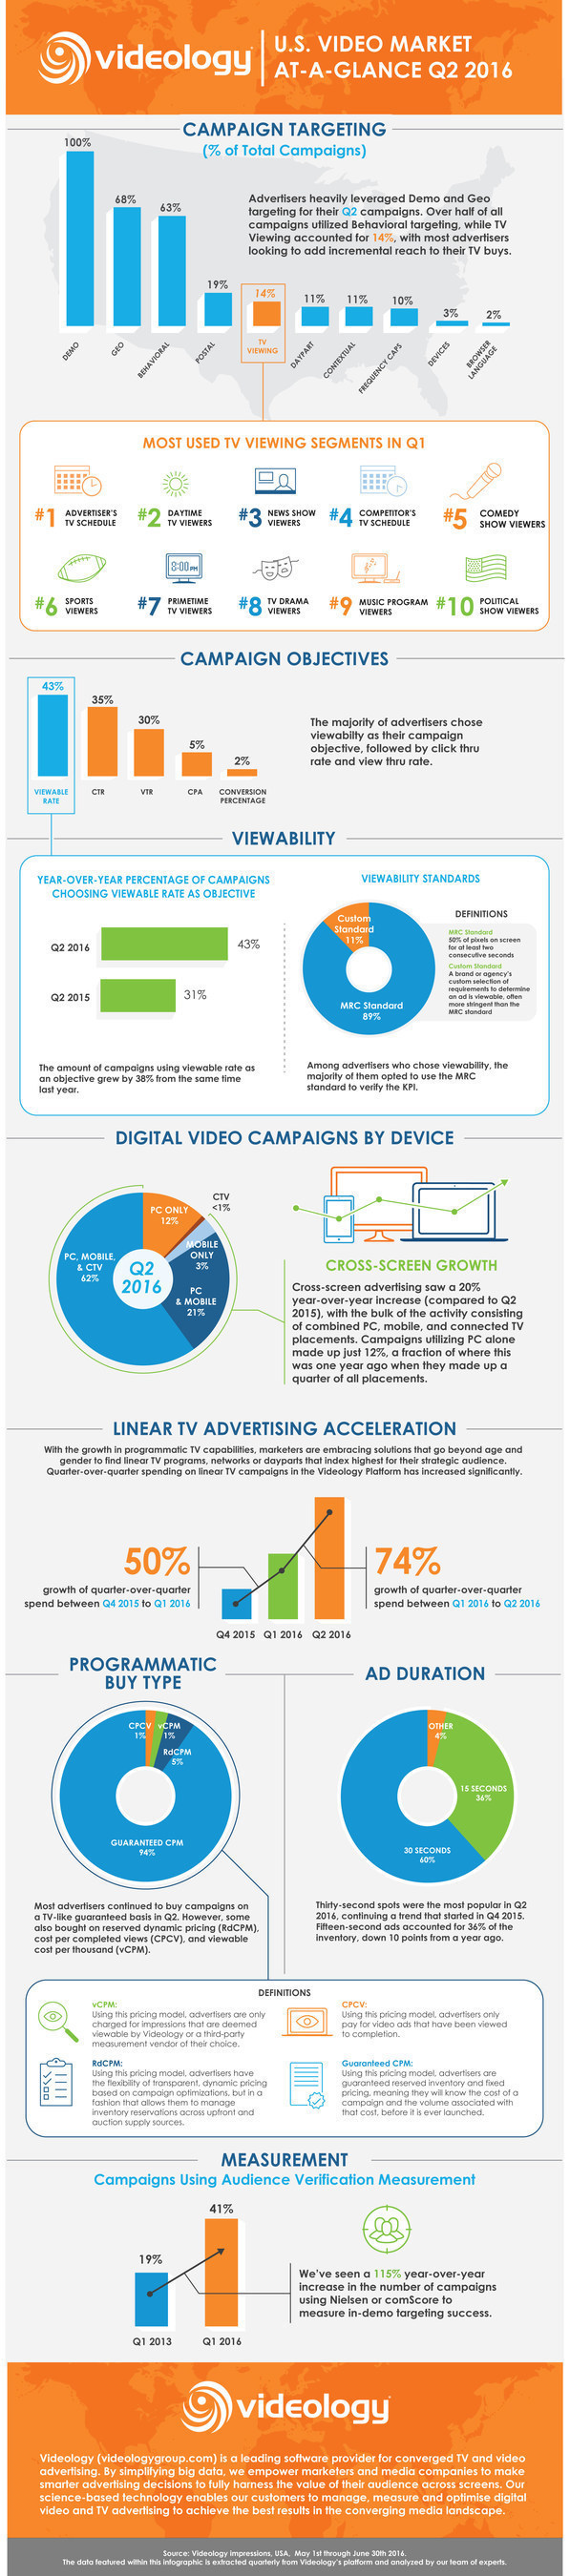 Videology's Q2 U.S. Video Market At-A-Glance Report